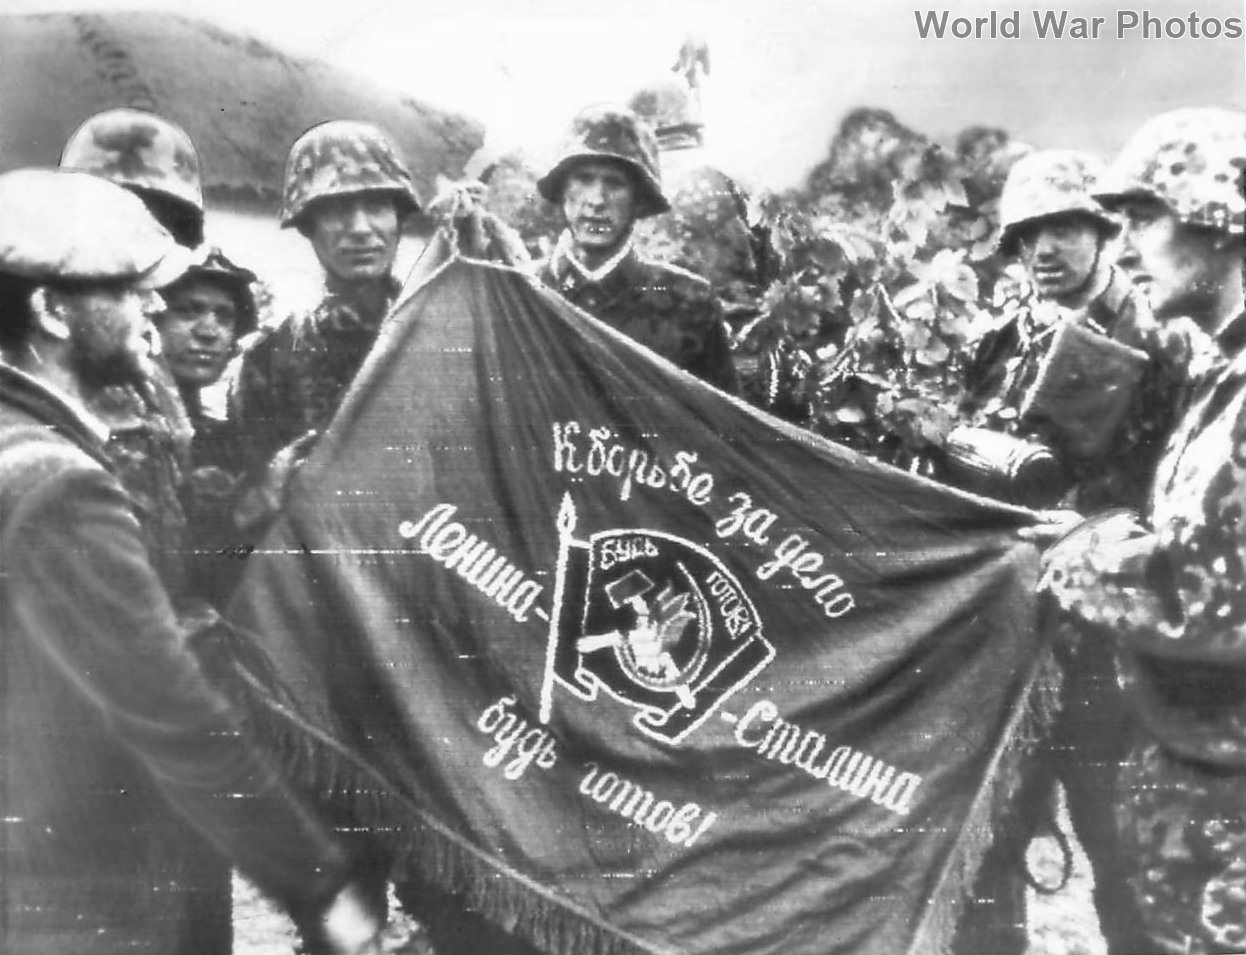 1st SS Panzer Division Leibstandarte SS Adolf Hitler